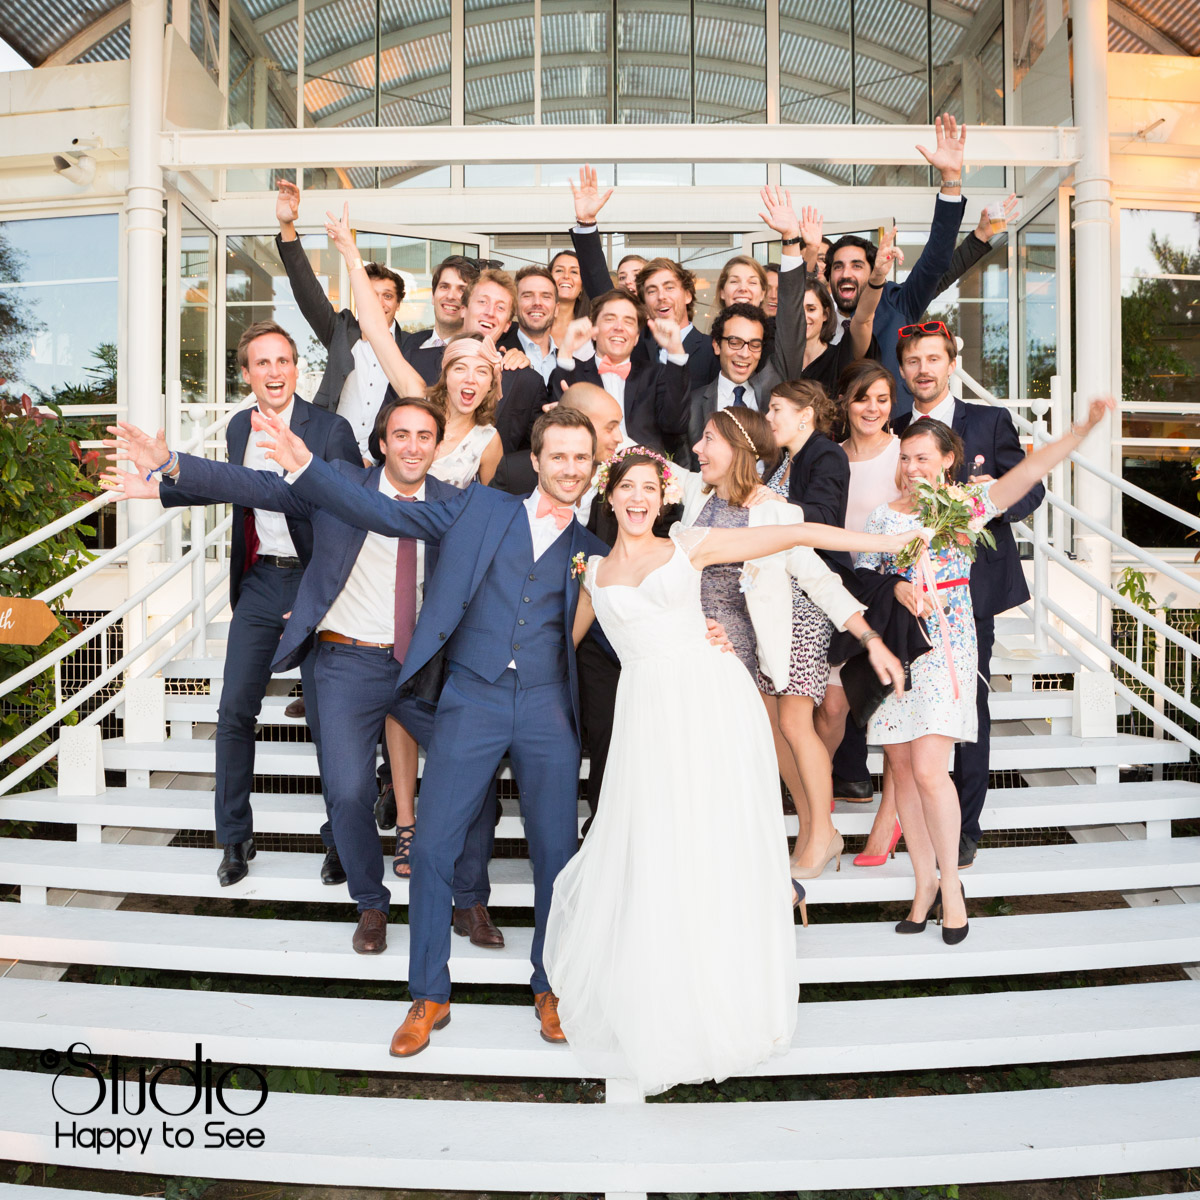 mariage salle tir au vol arcachon